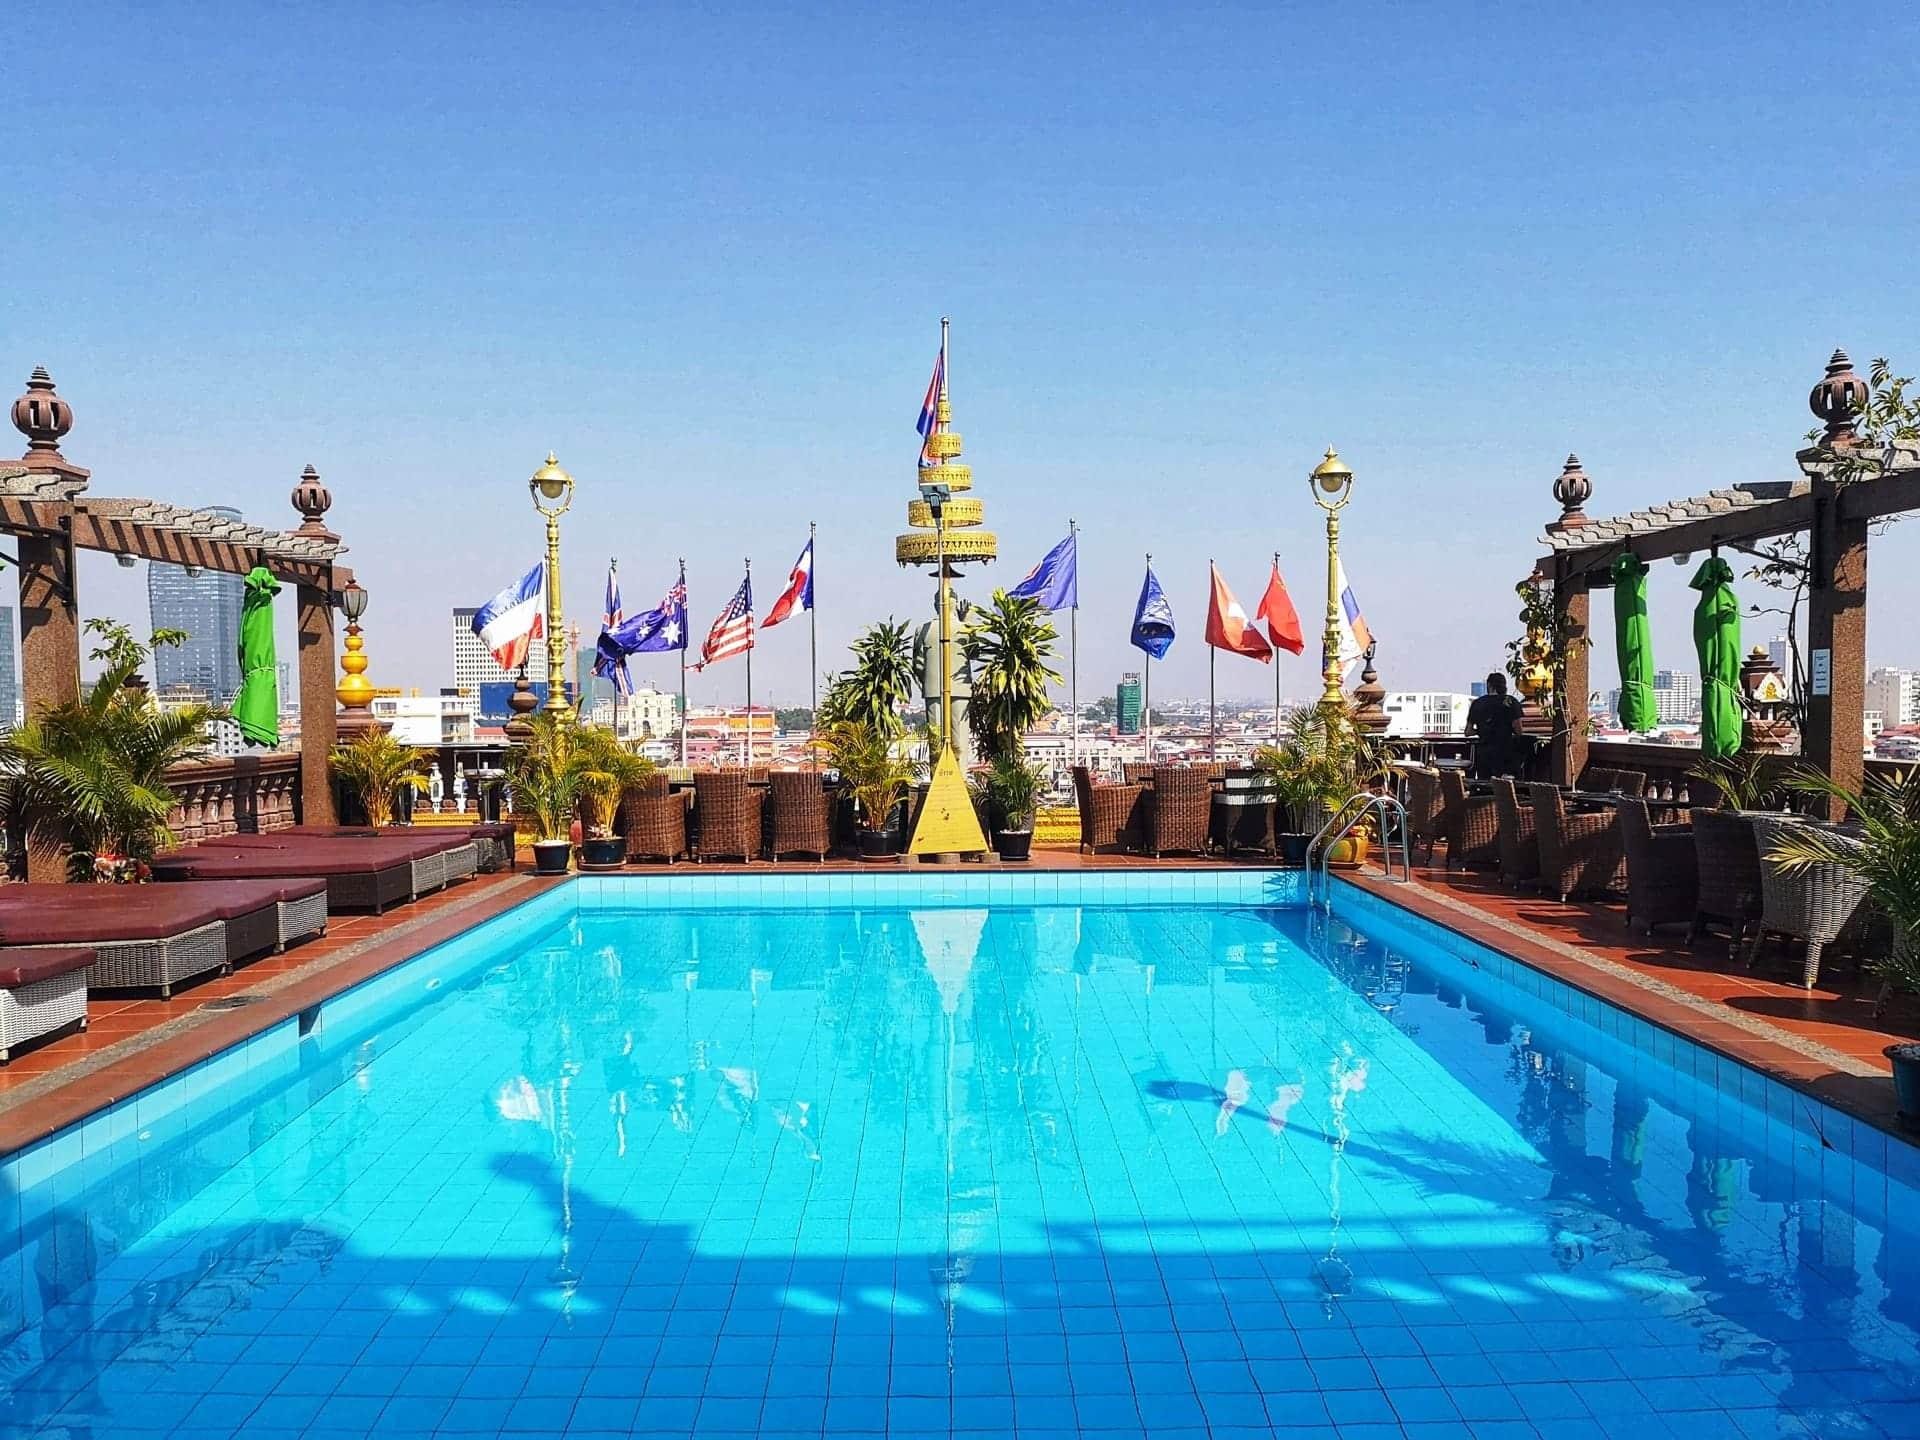 tagterrasse på hotel i Phnom Penh